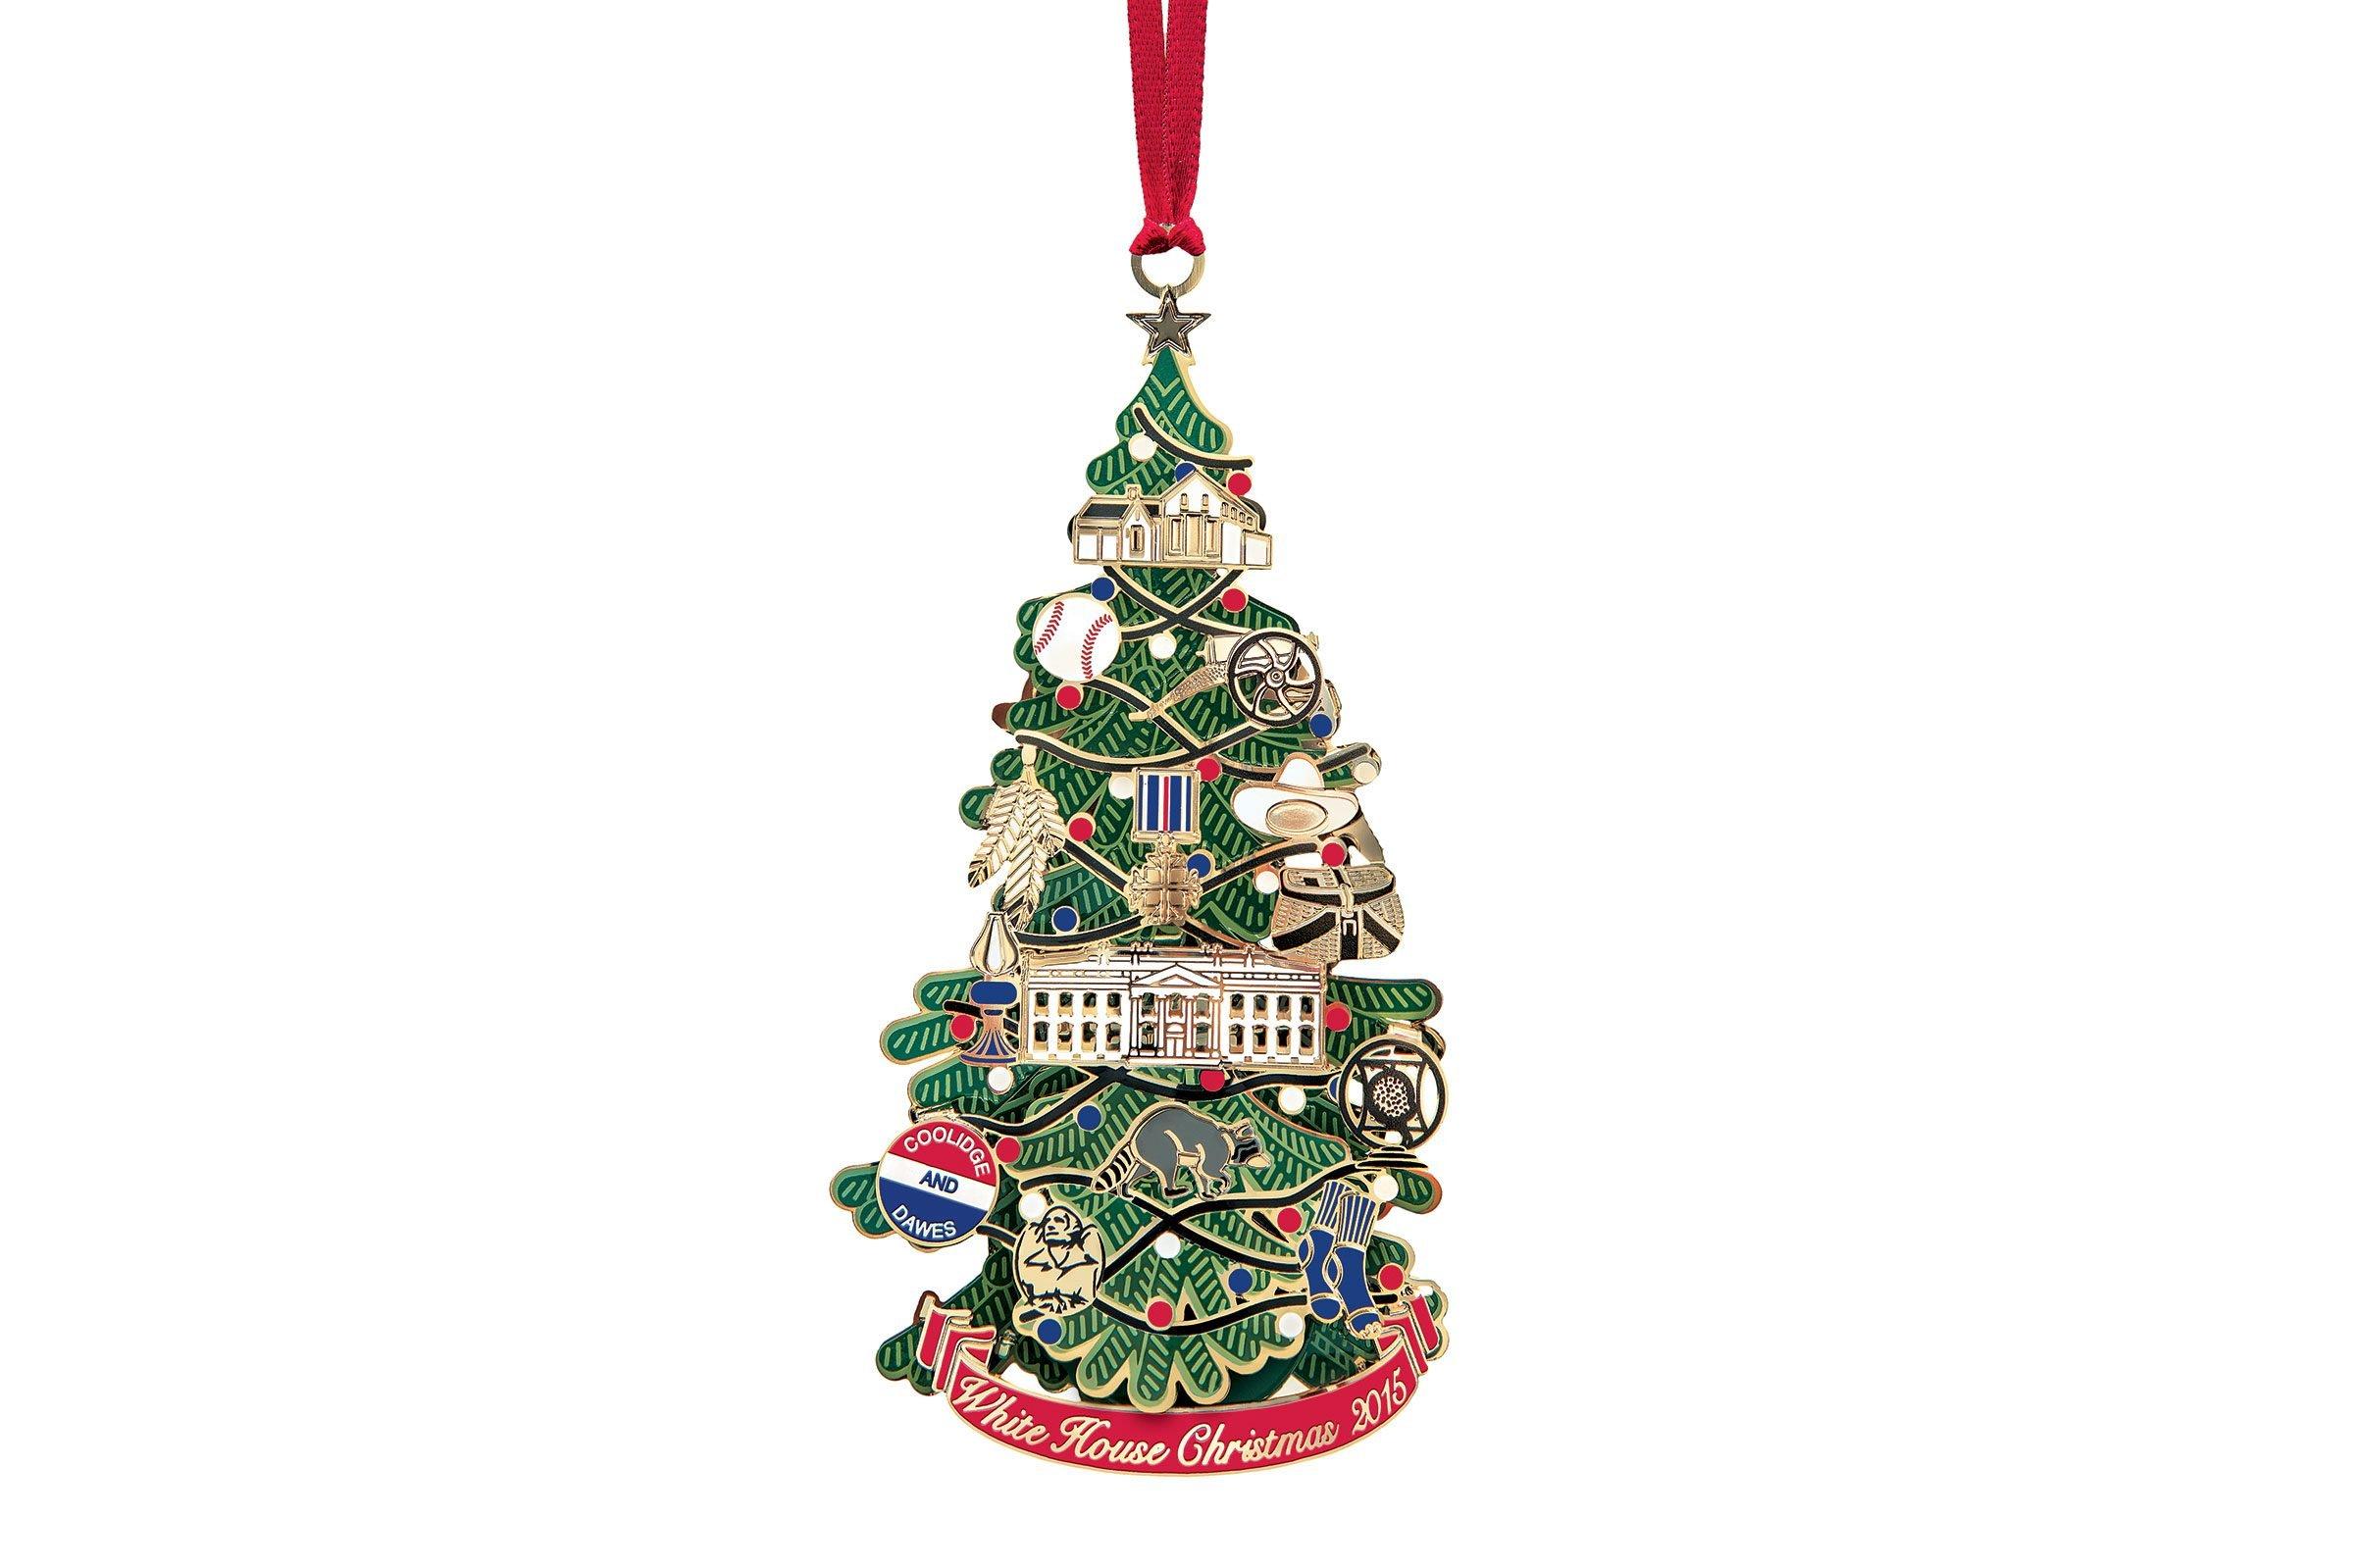 Career christmas ornaments - 2015 The President Who Brought Christmas Cheer